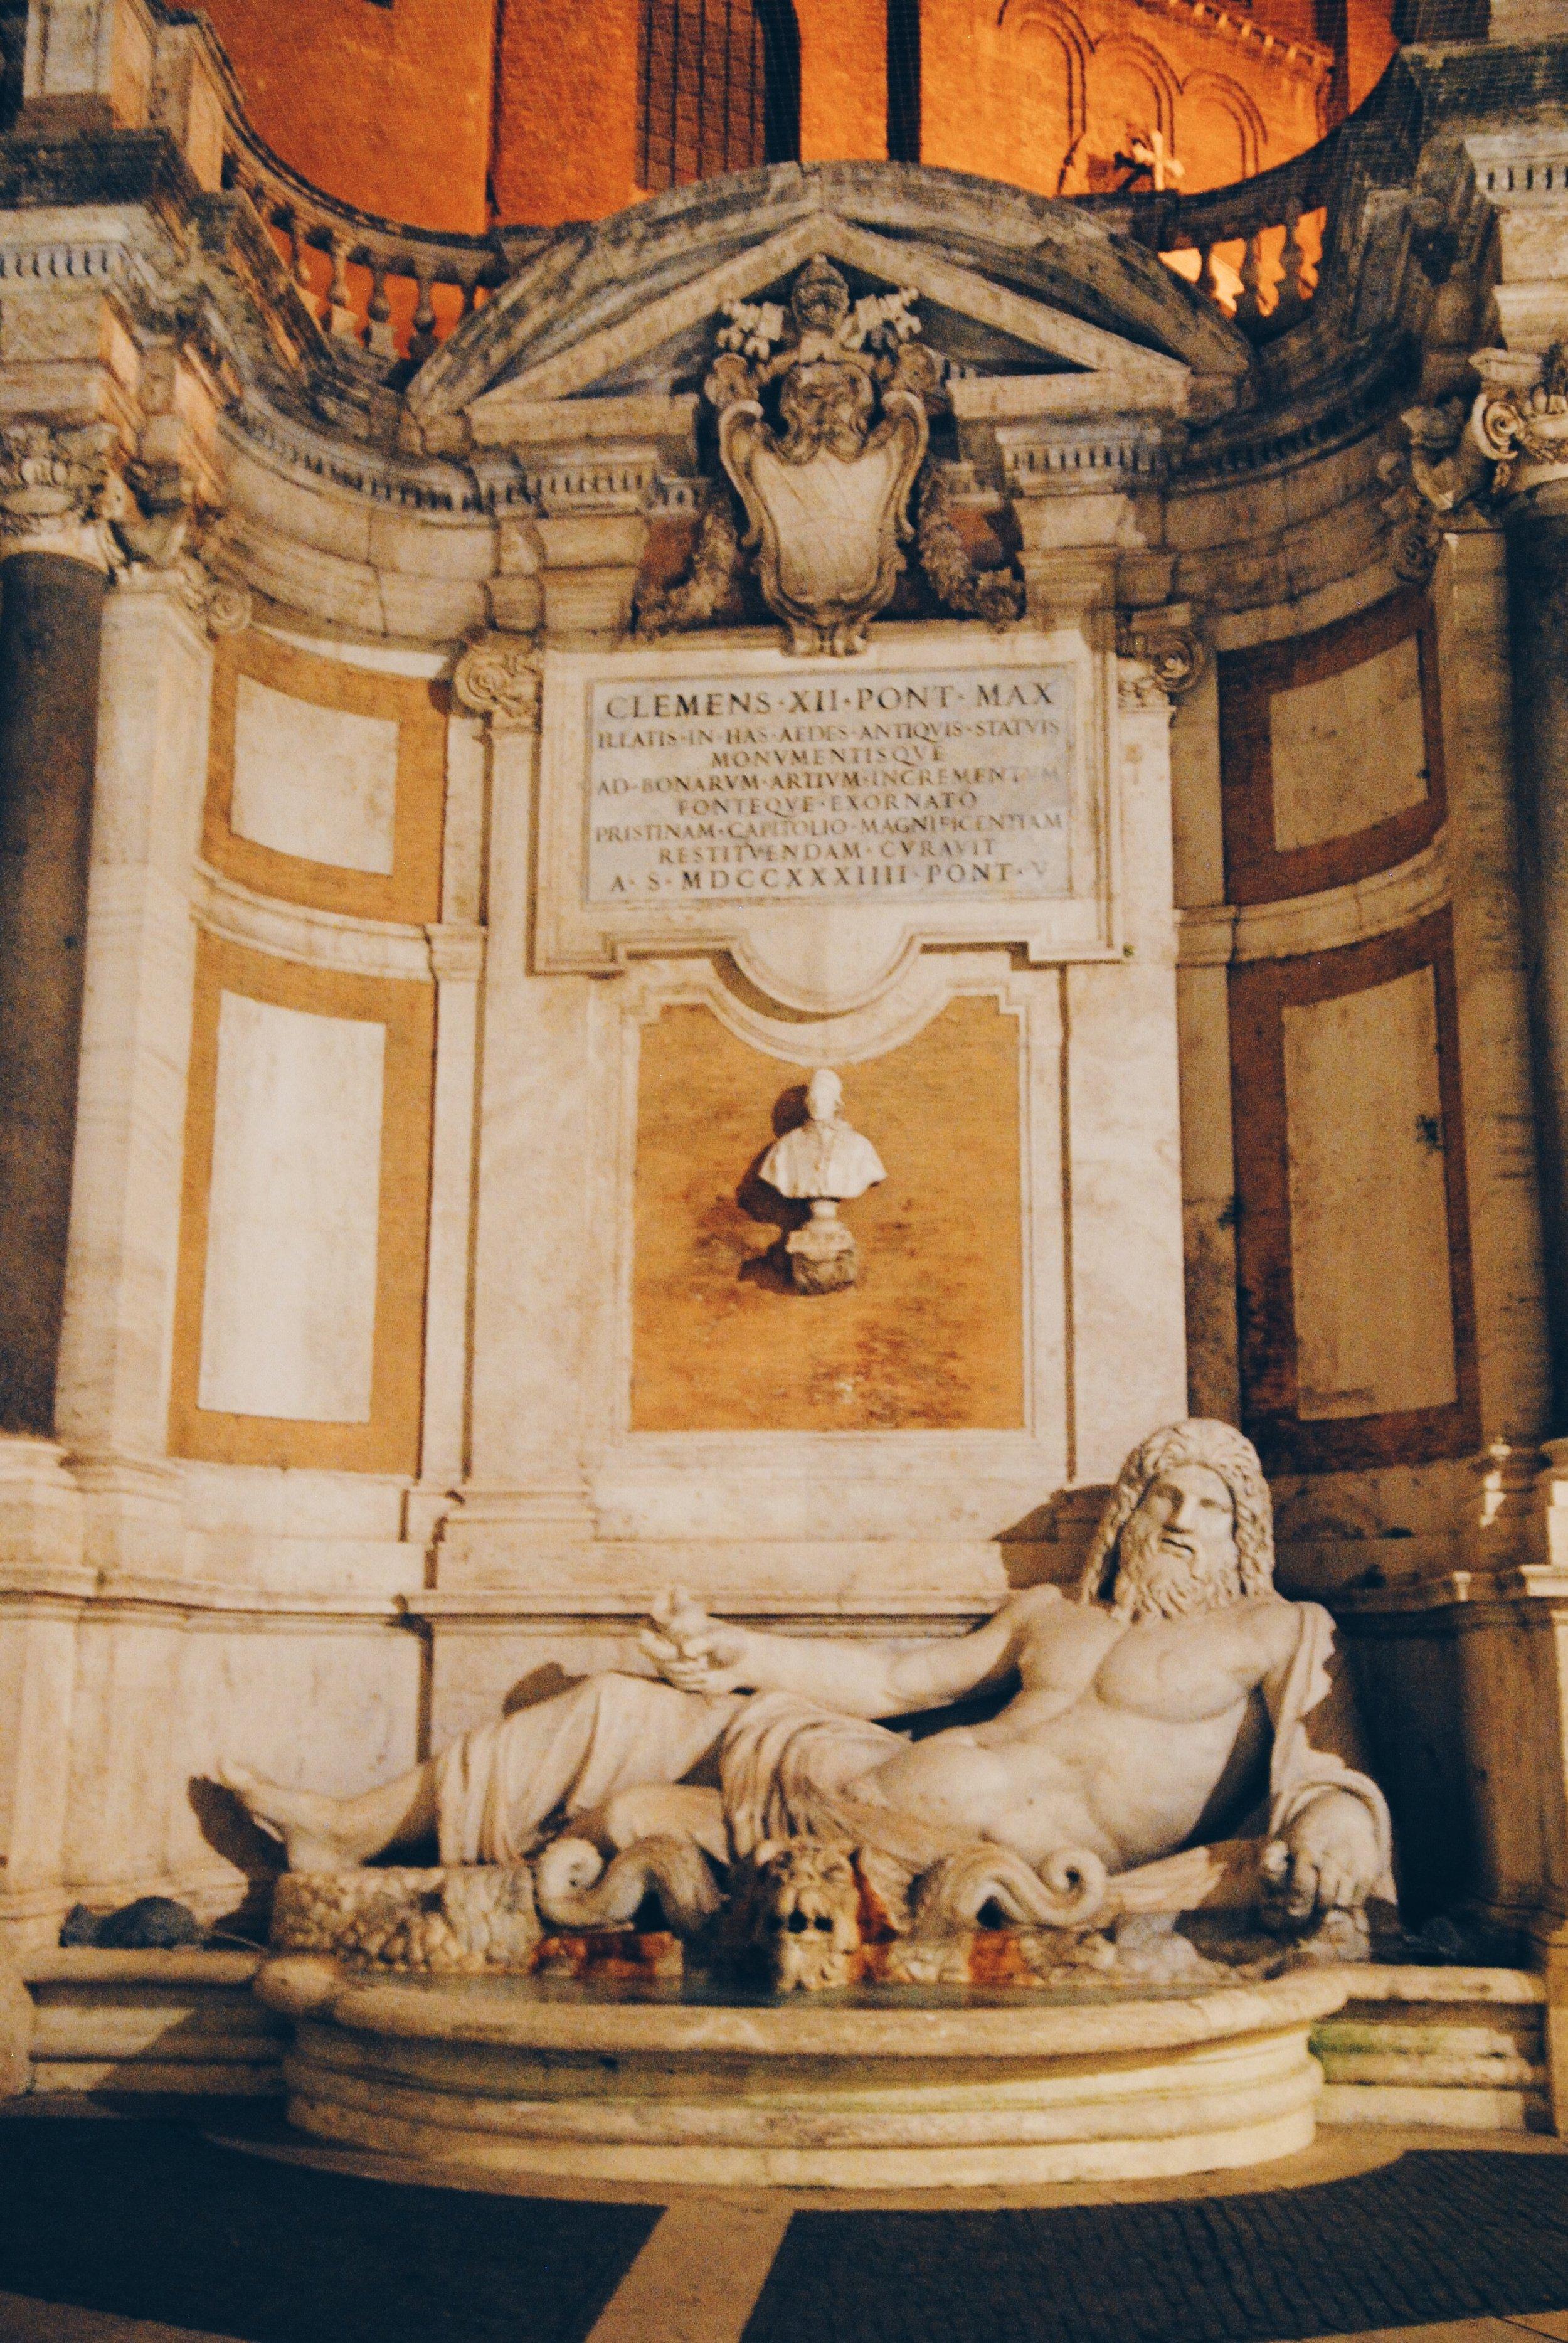 Capitoline Museums: Oceanus Fountain